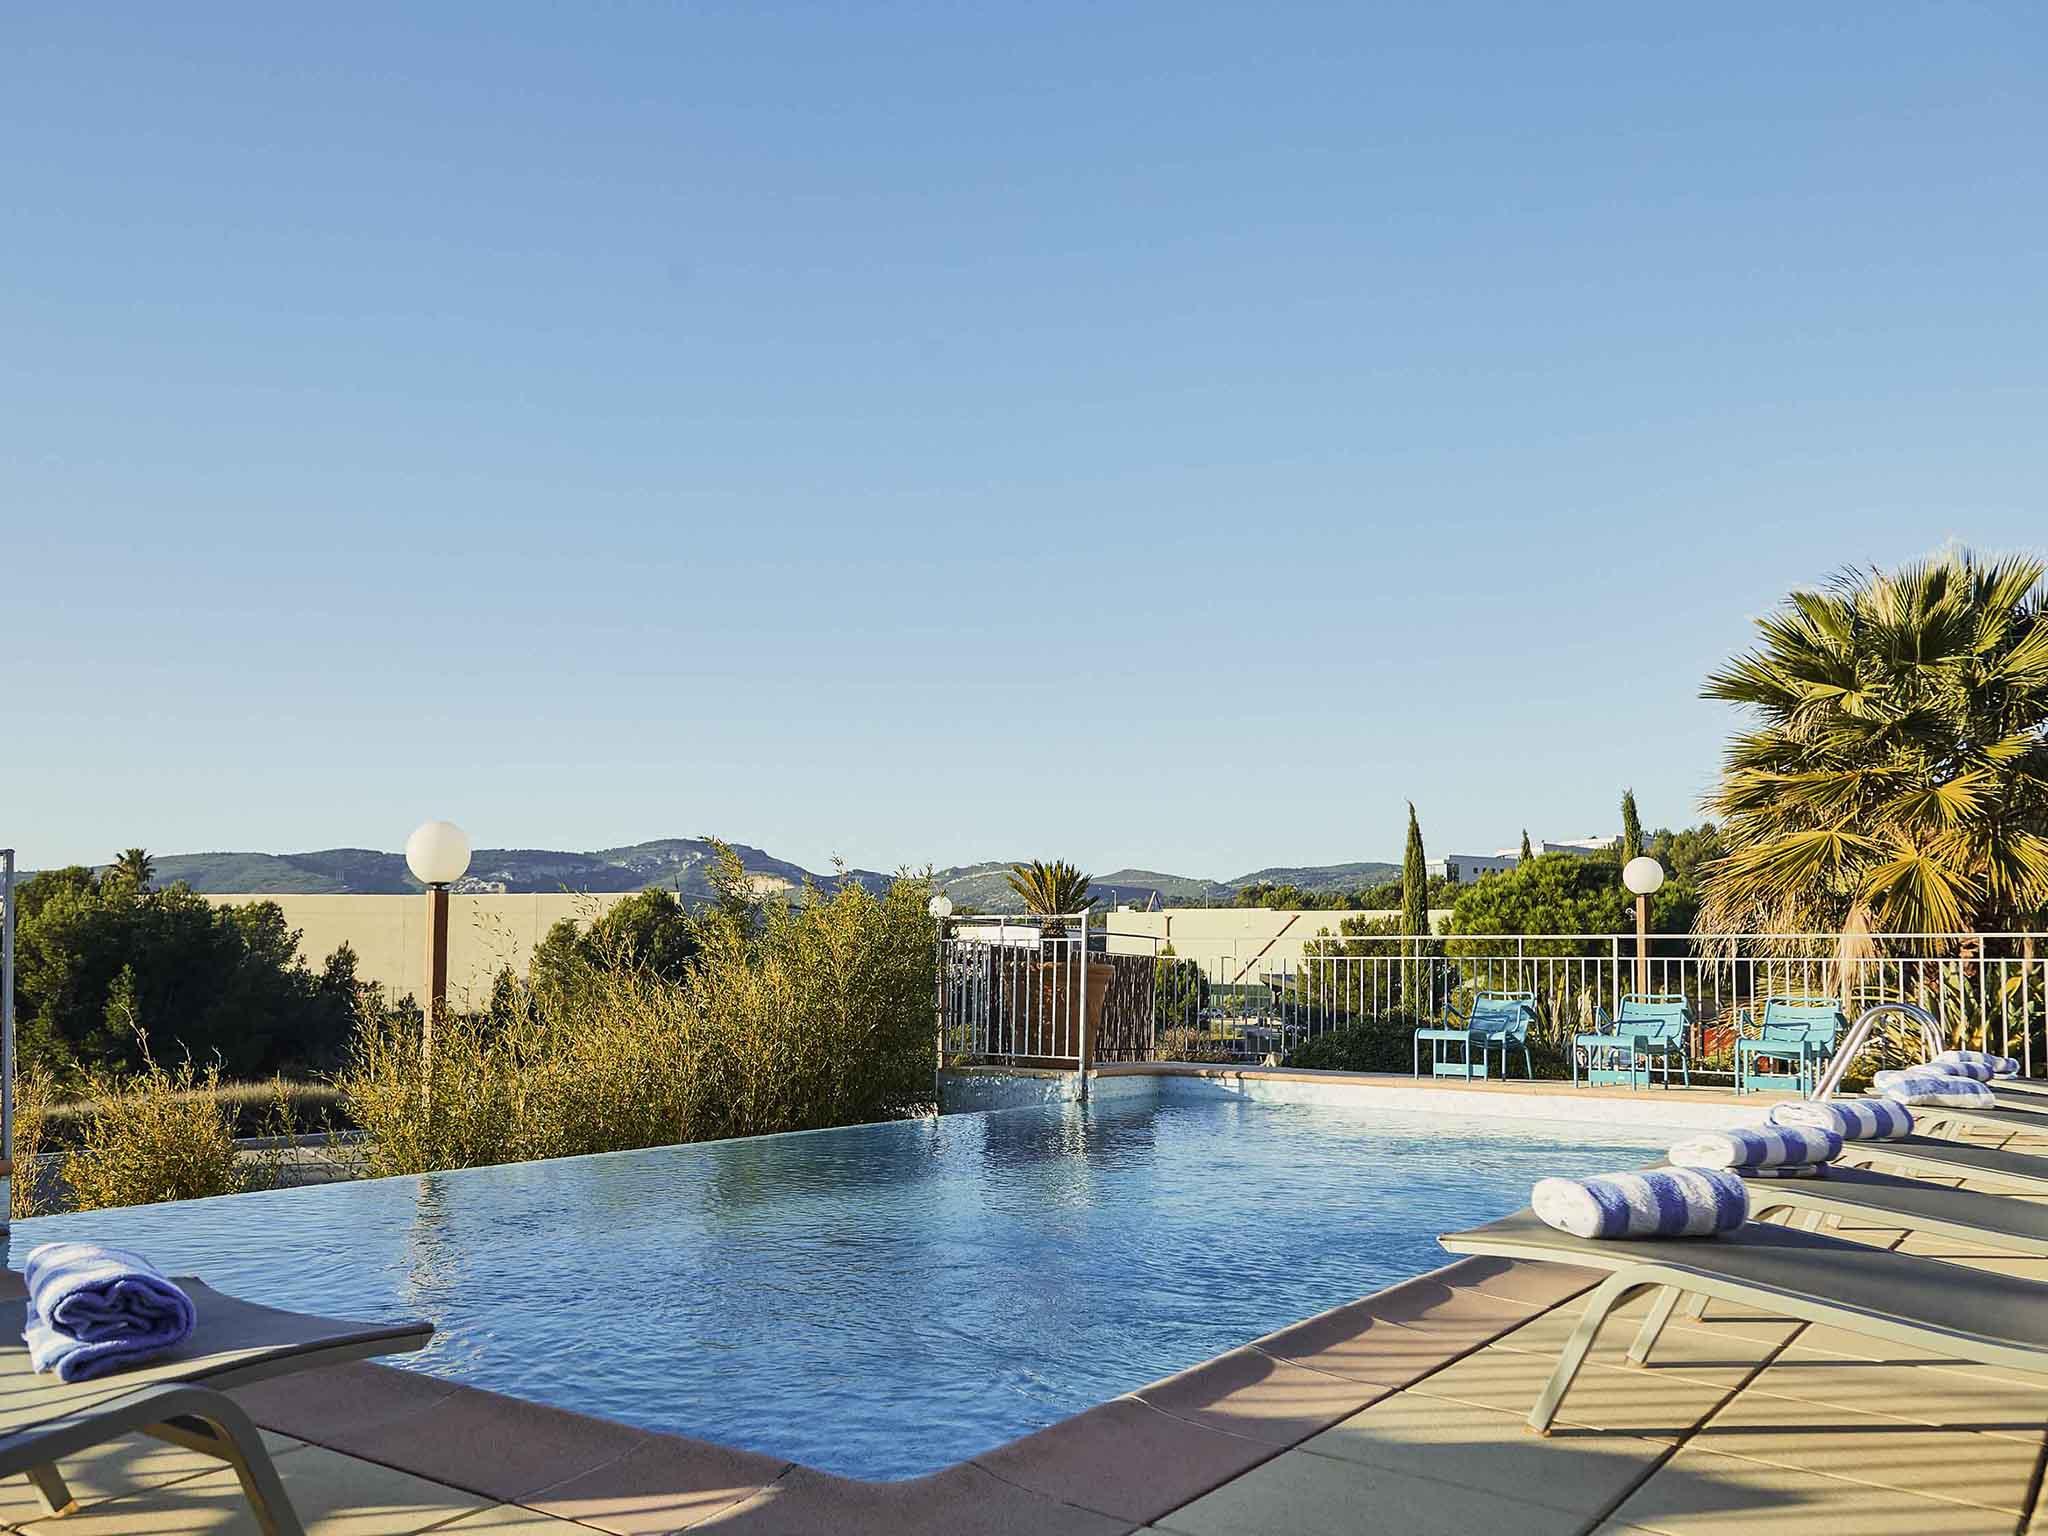 Hotel In La Ciotat - Ibis La Ciotat - All pour Hotel Piscine Marseille